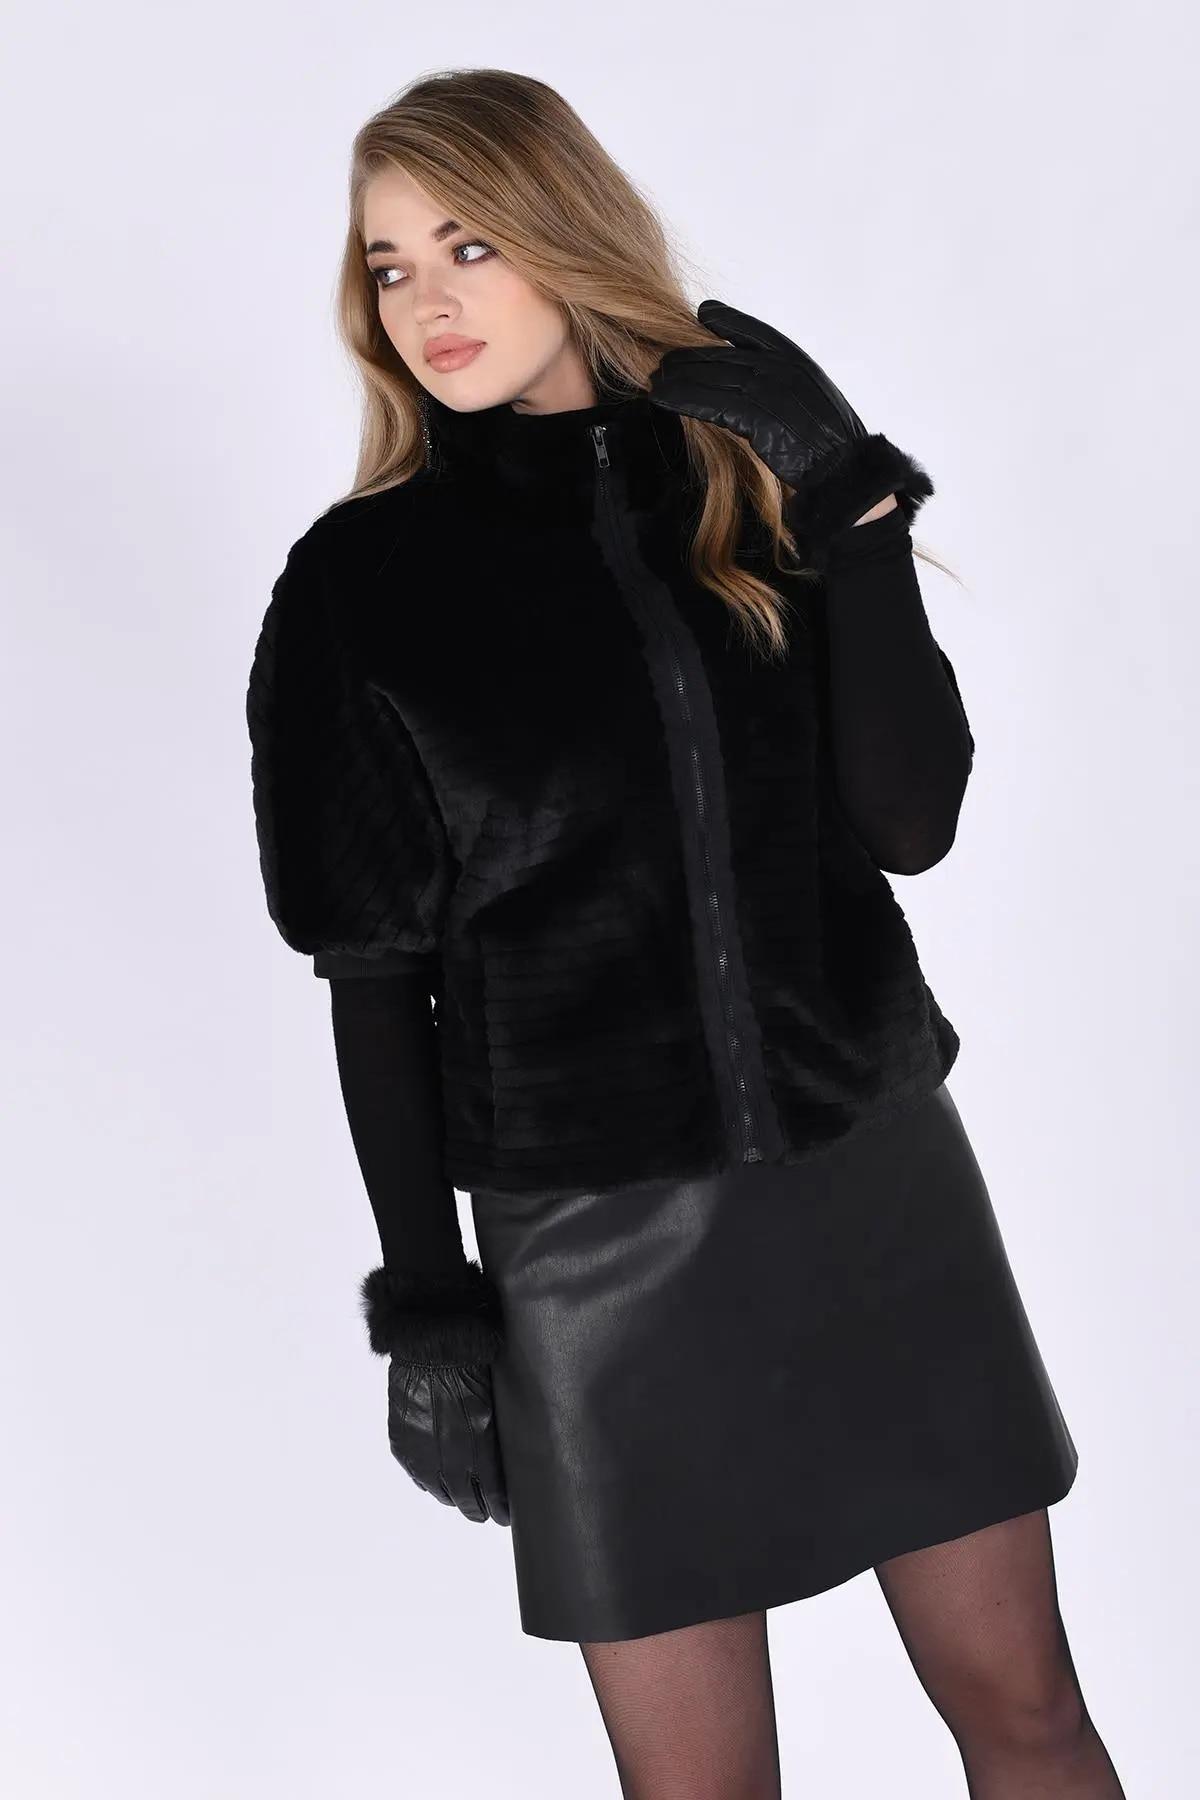 New Fashion Black Color Zipper Short Faux Fur 2021 Sexy Style Plus Size Jackets For Women 4xl 5xl 6xl